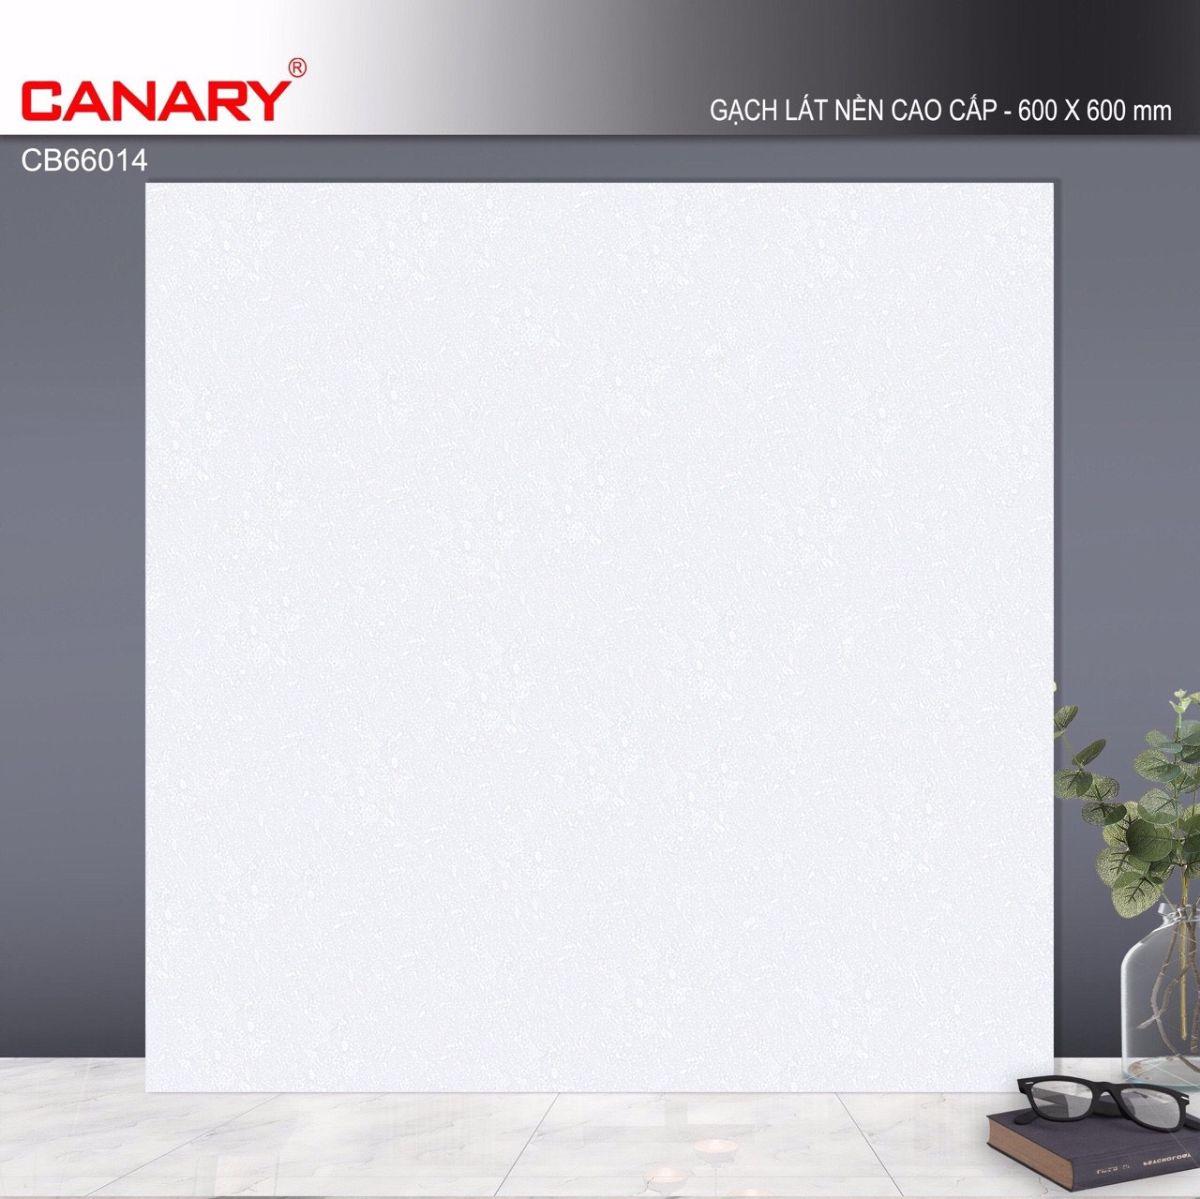 Canary KT 60x60 mã CB66014